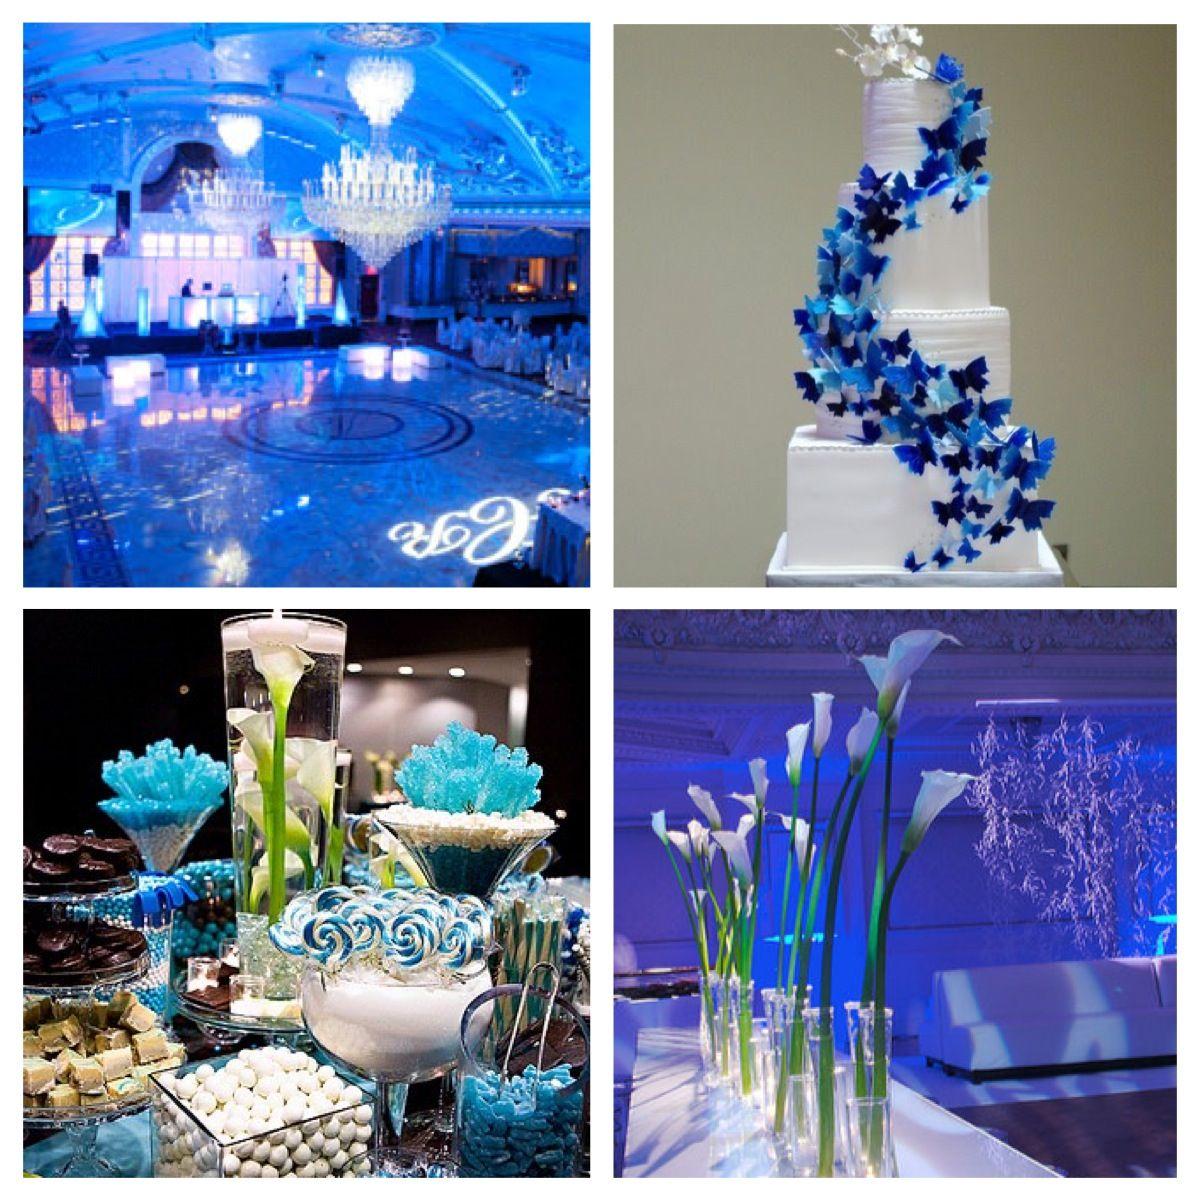 Dallas Cowboys Themed Wedding Ideas Reception Decorations Centerpieces White